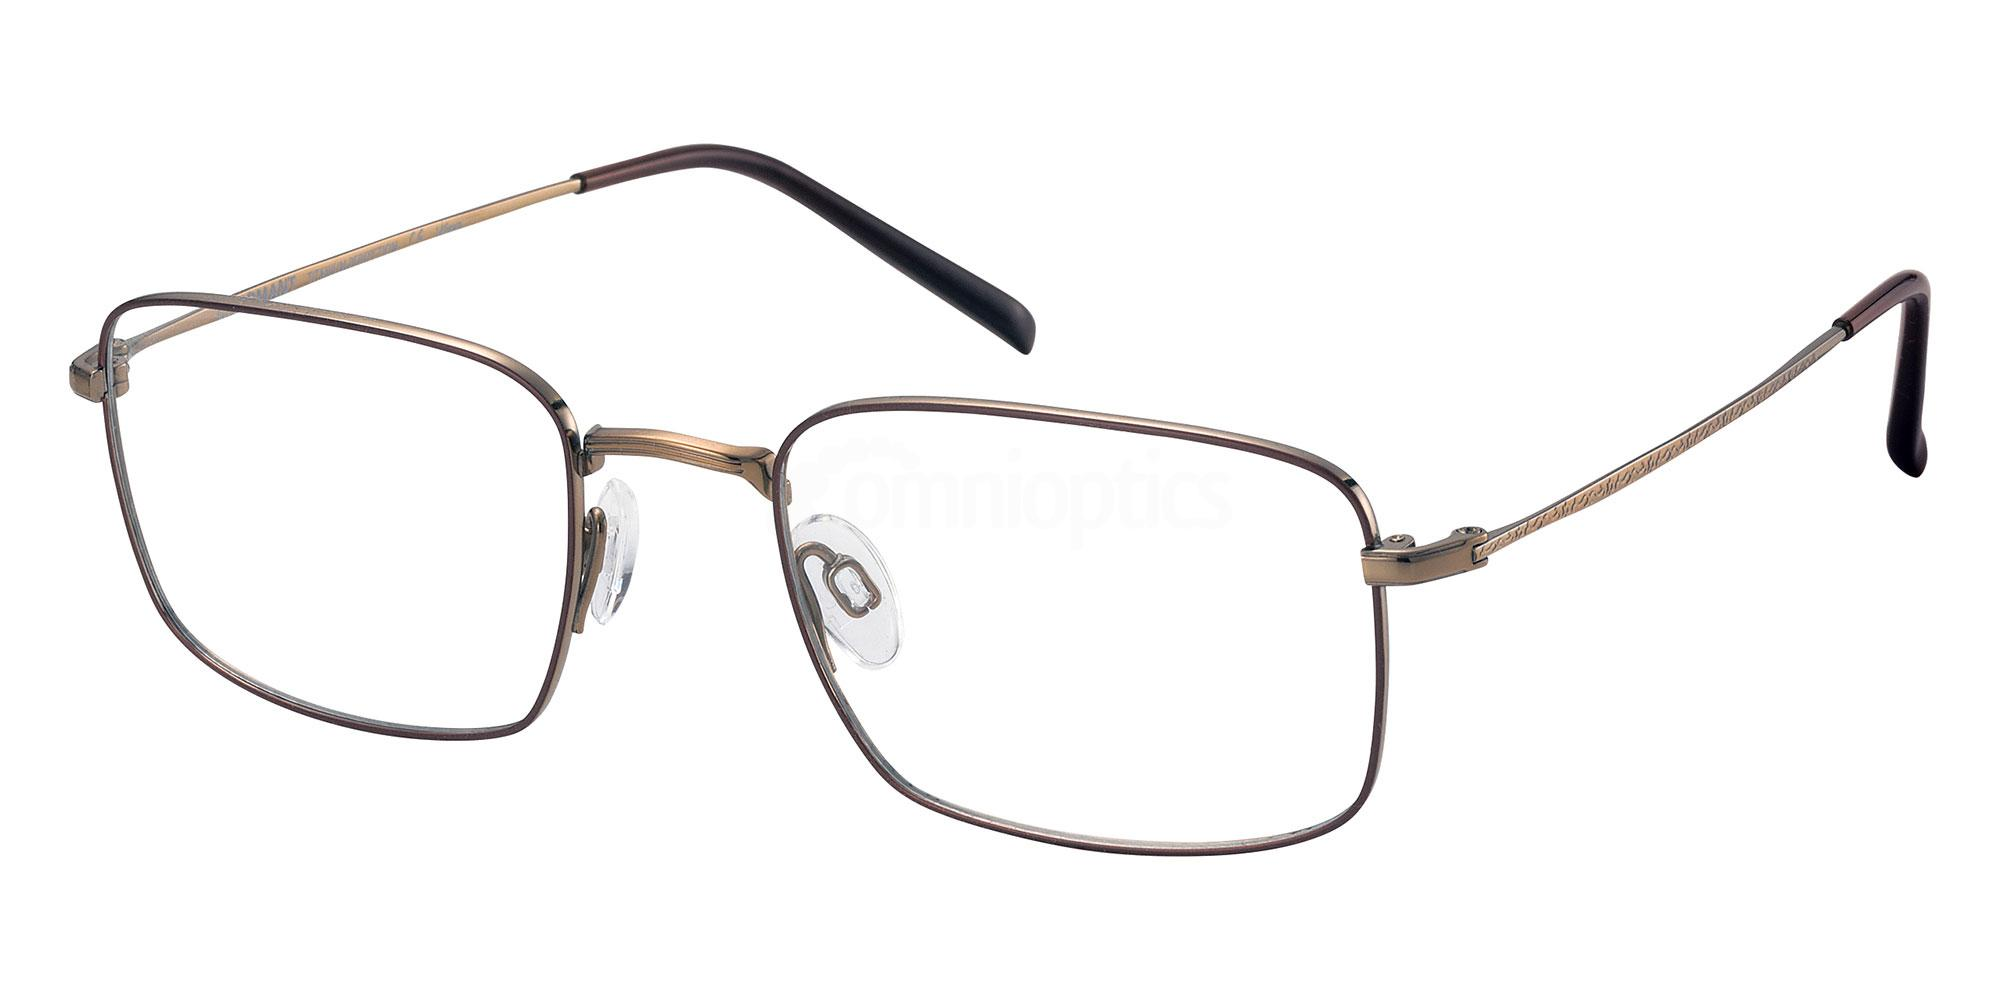 GD CH29701 Glasses, Charmant Titanium Perfection